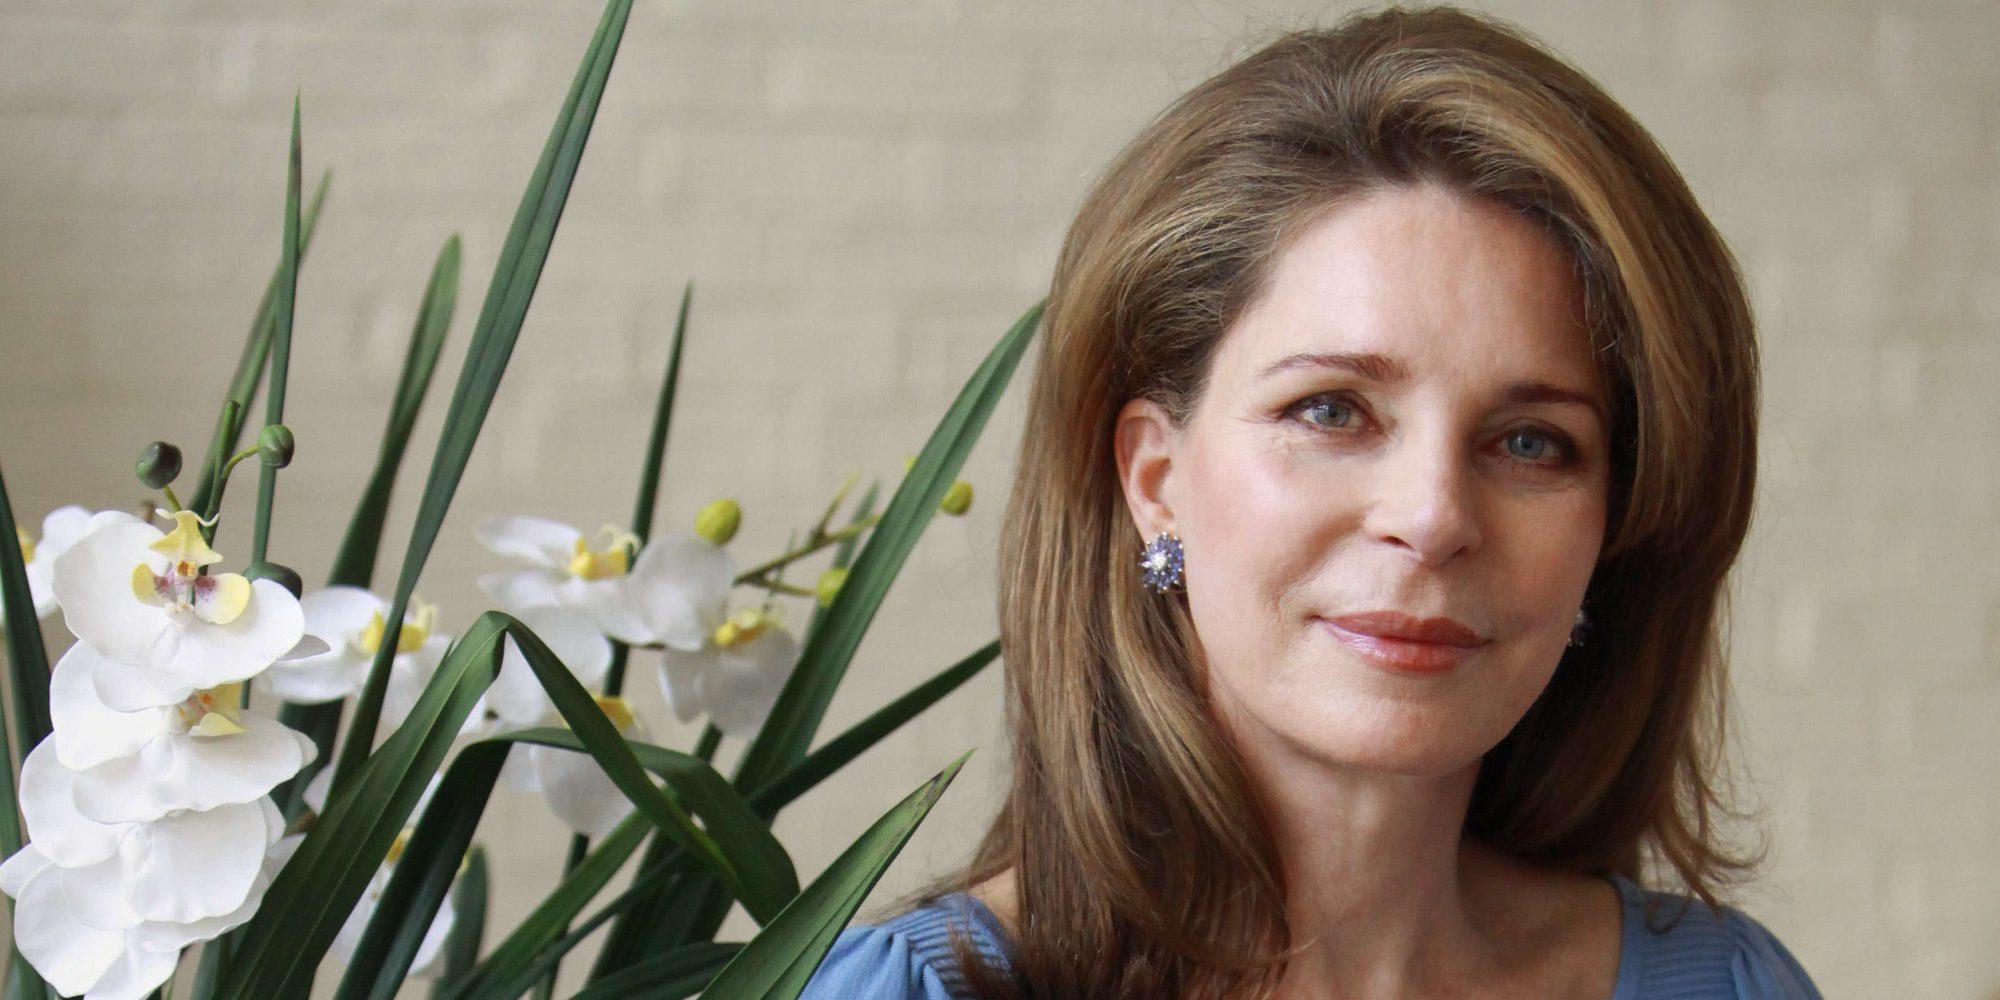 Noor de Jordania, la reina olvidada que quedó a la sombra de Rania de Jordania